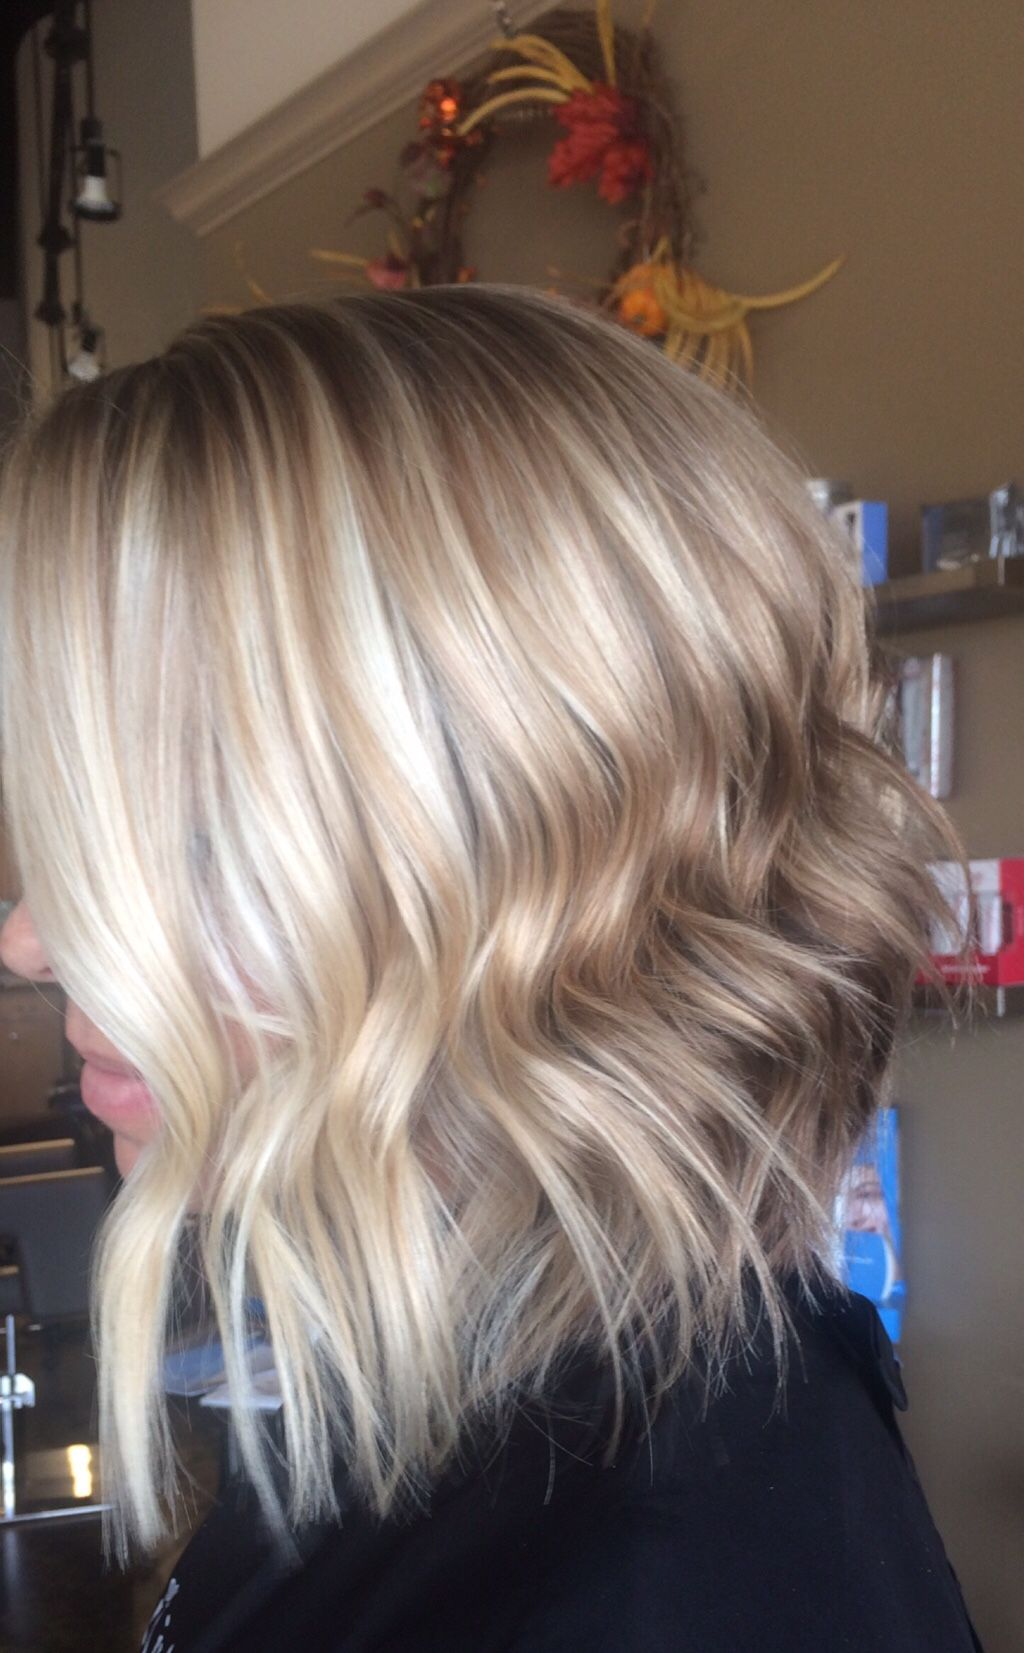 Dimensional Platinum Blonde Hair Toupee Shades Of Blonde Hair